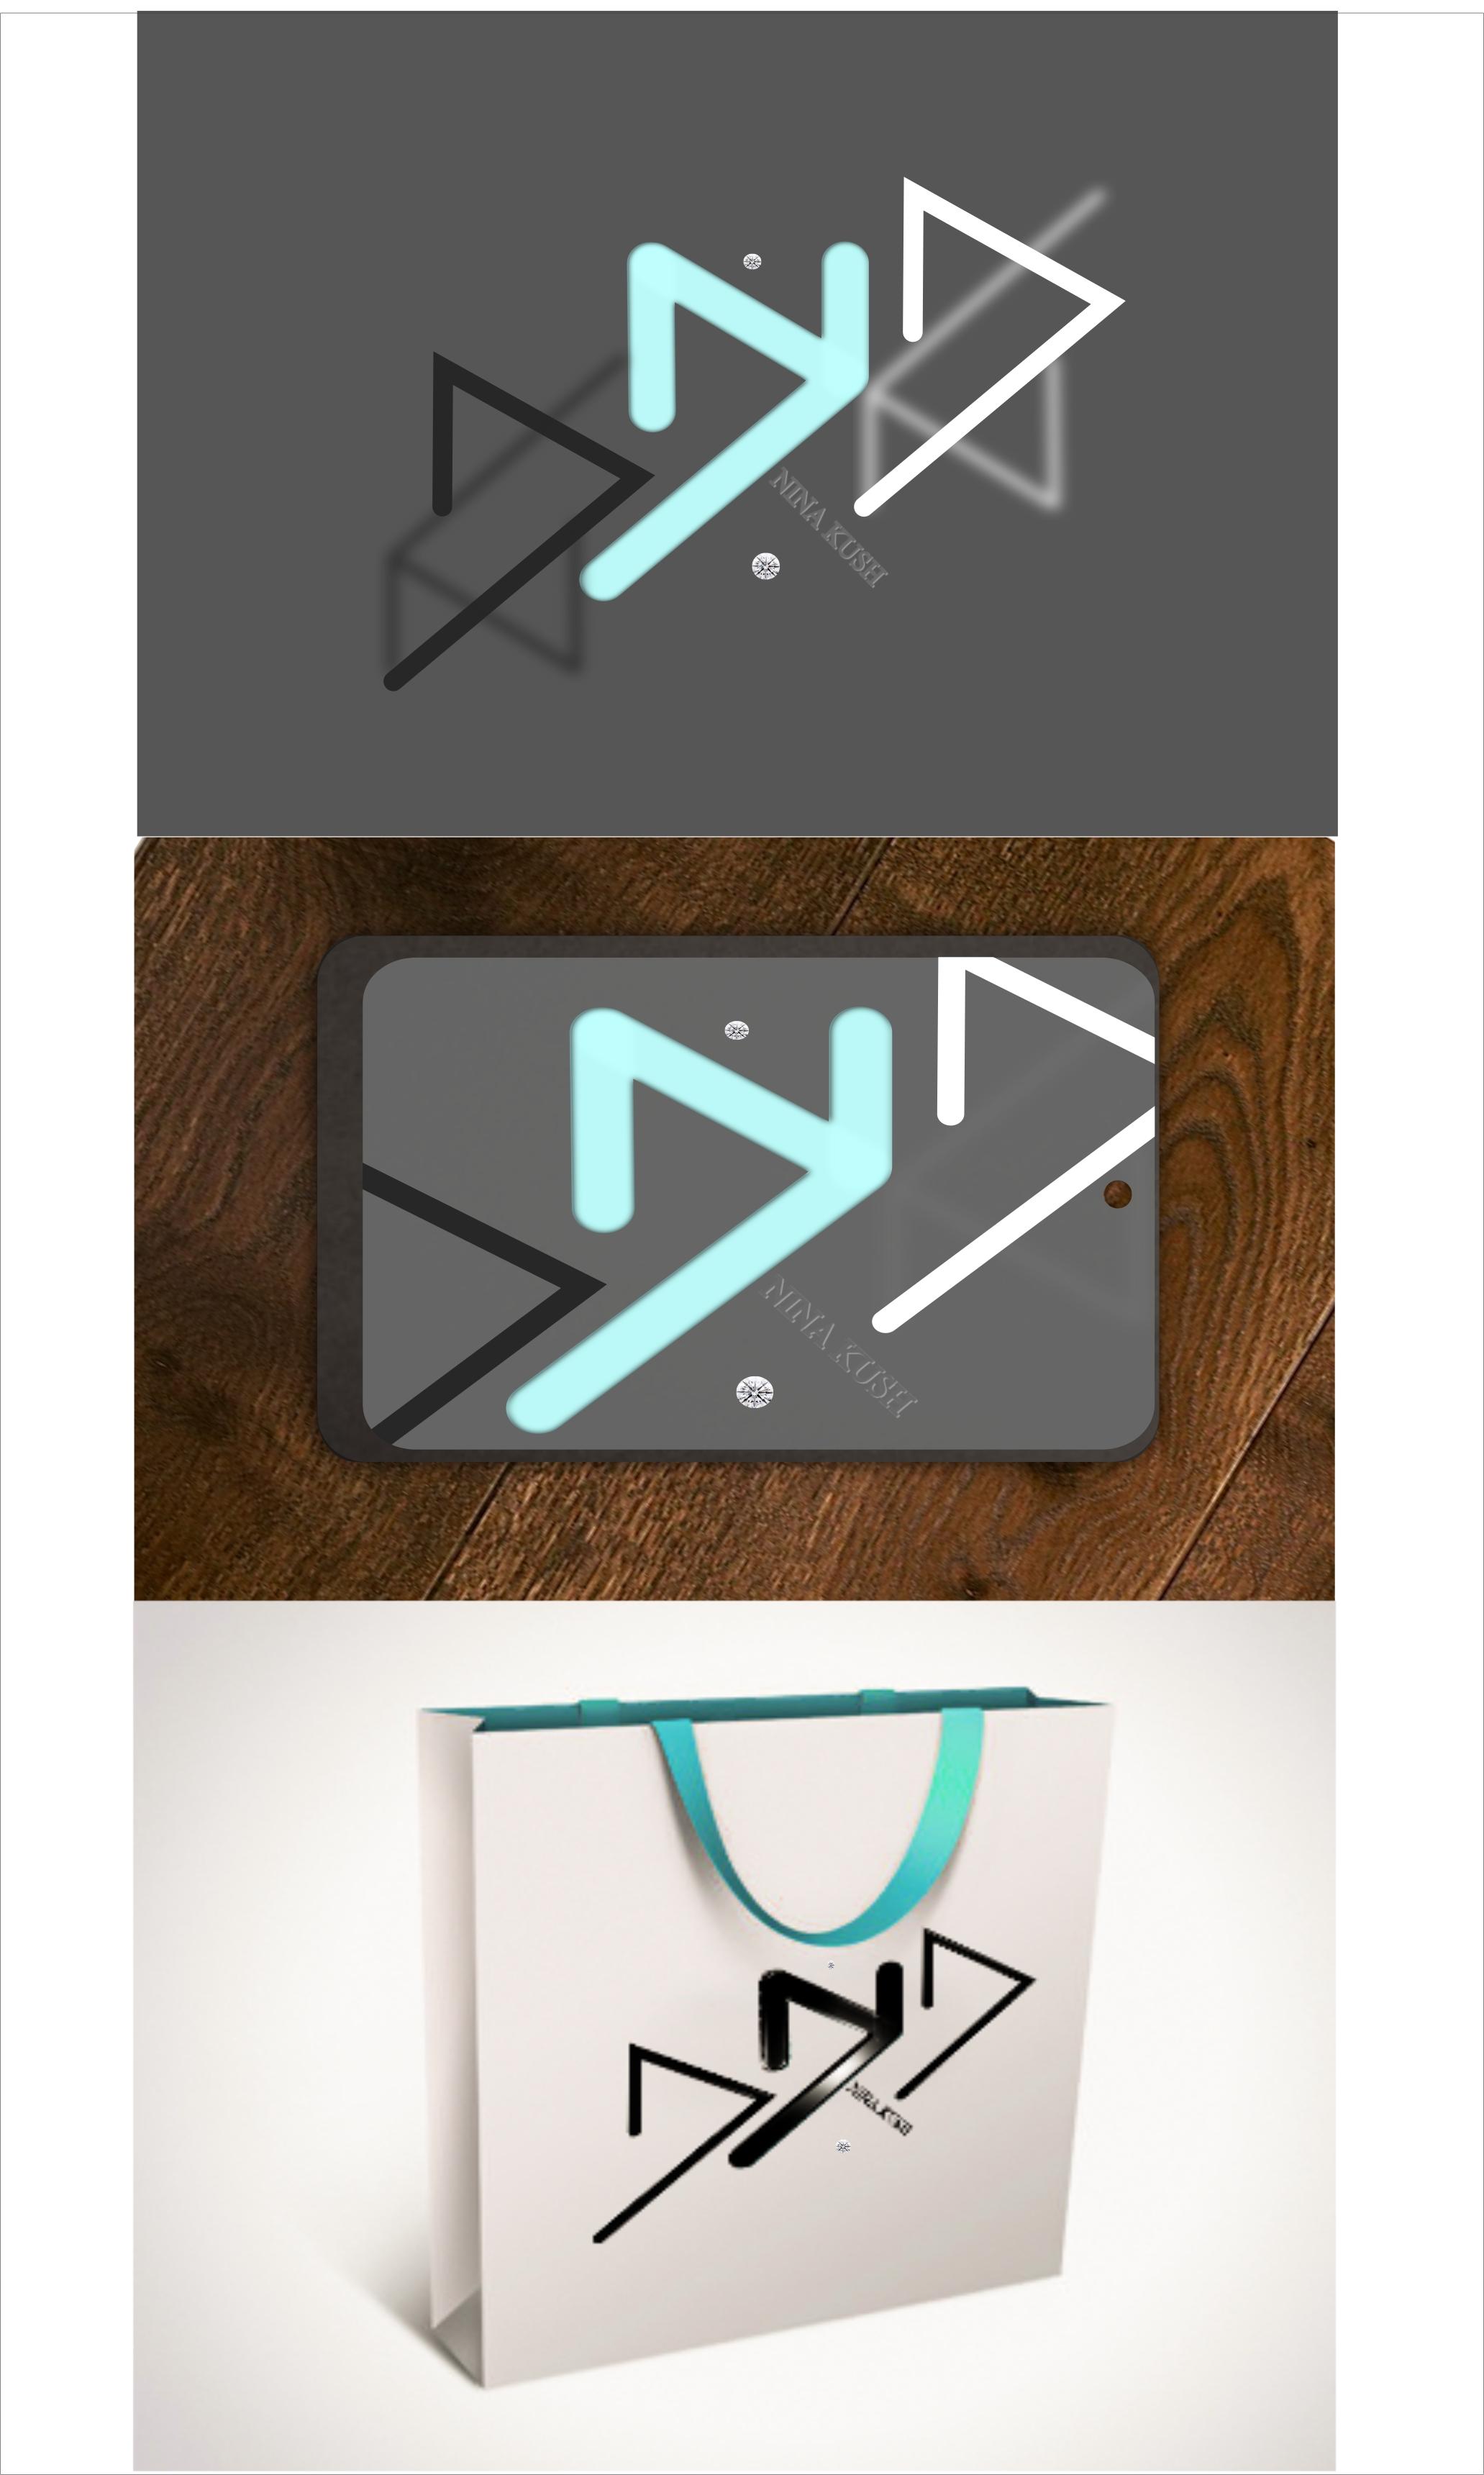 Логотип, товарный знак. Далее разработка brend booka компани фото f_3045ce05baf0ebbc.jpg